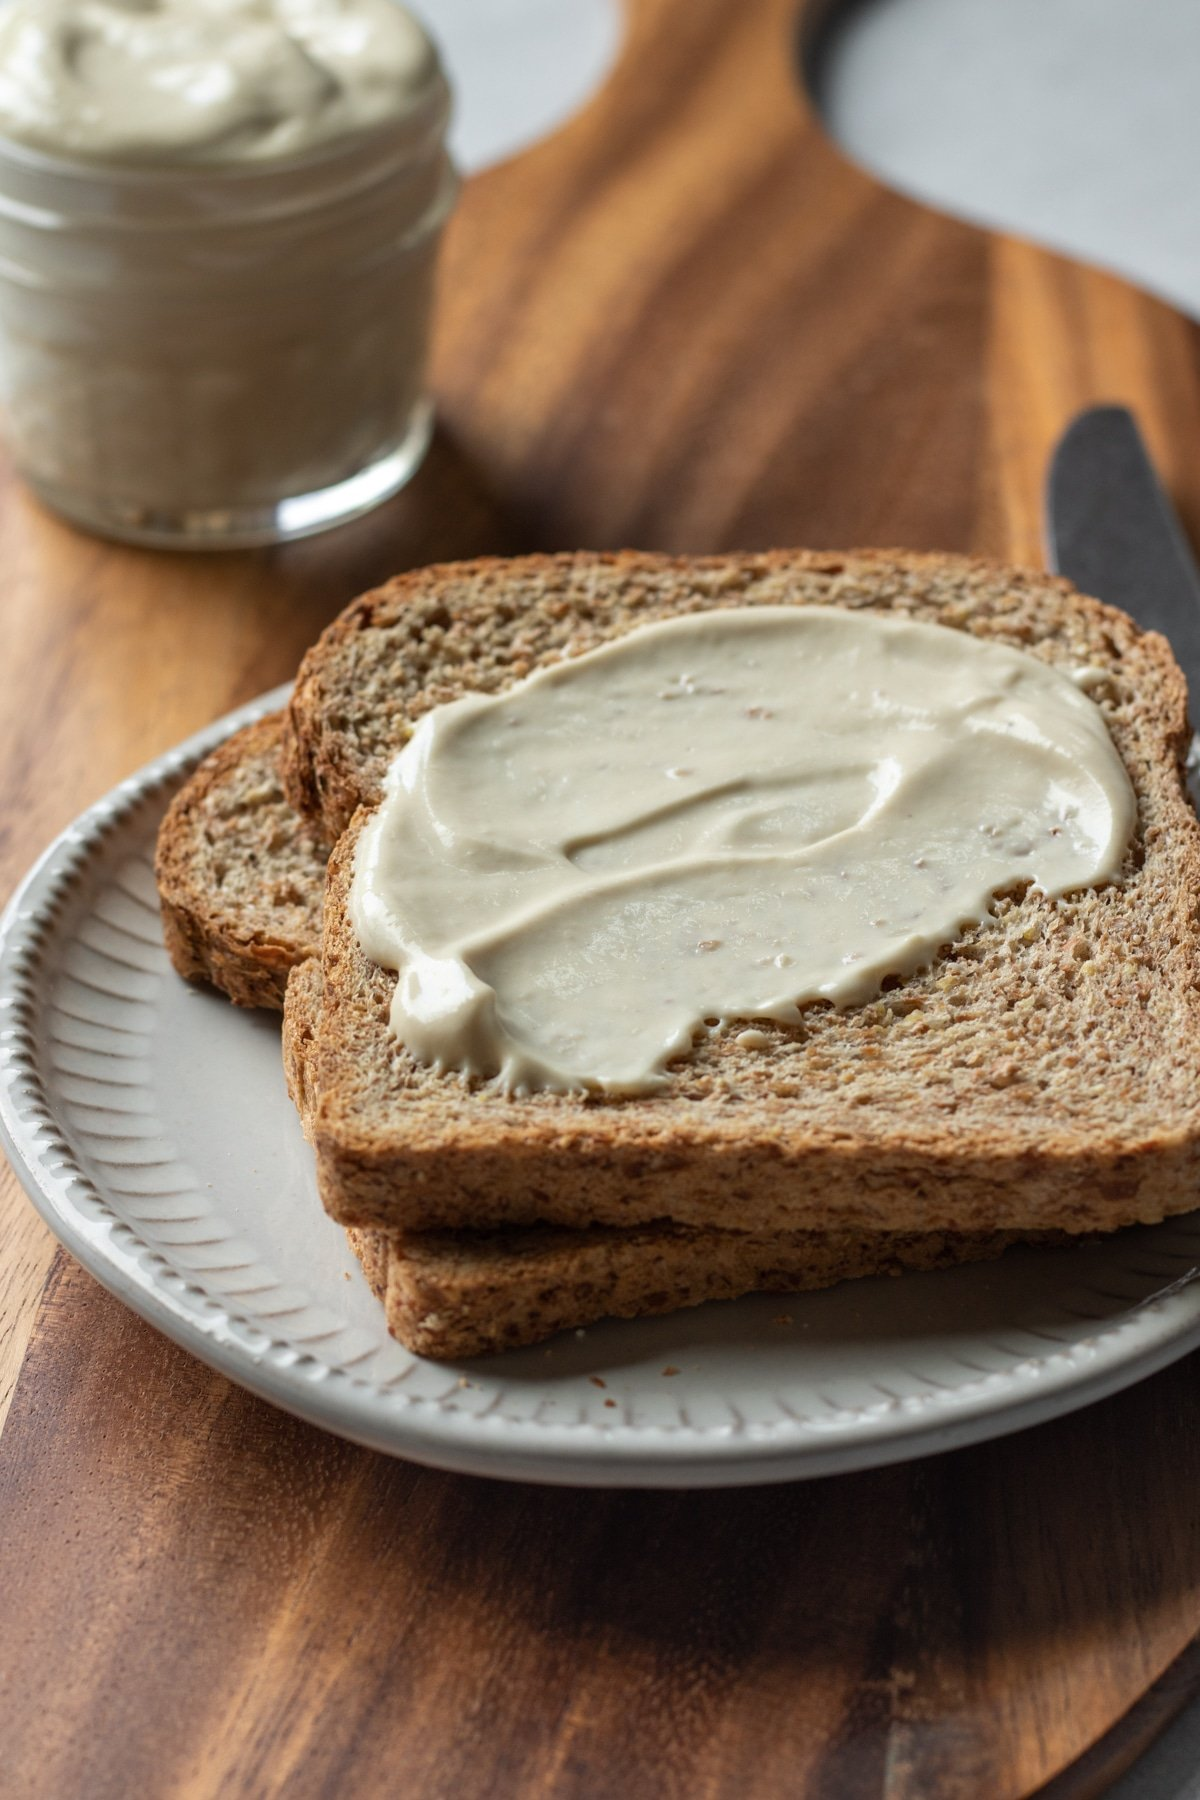 homemade aquafaba mayo spread on bread.